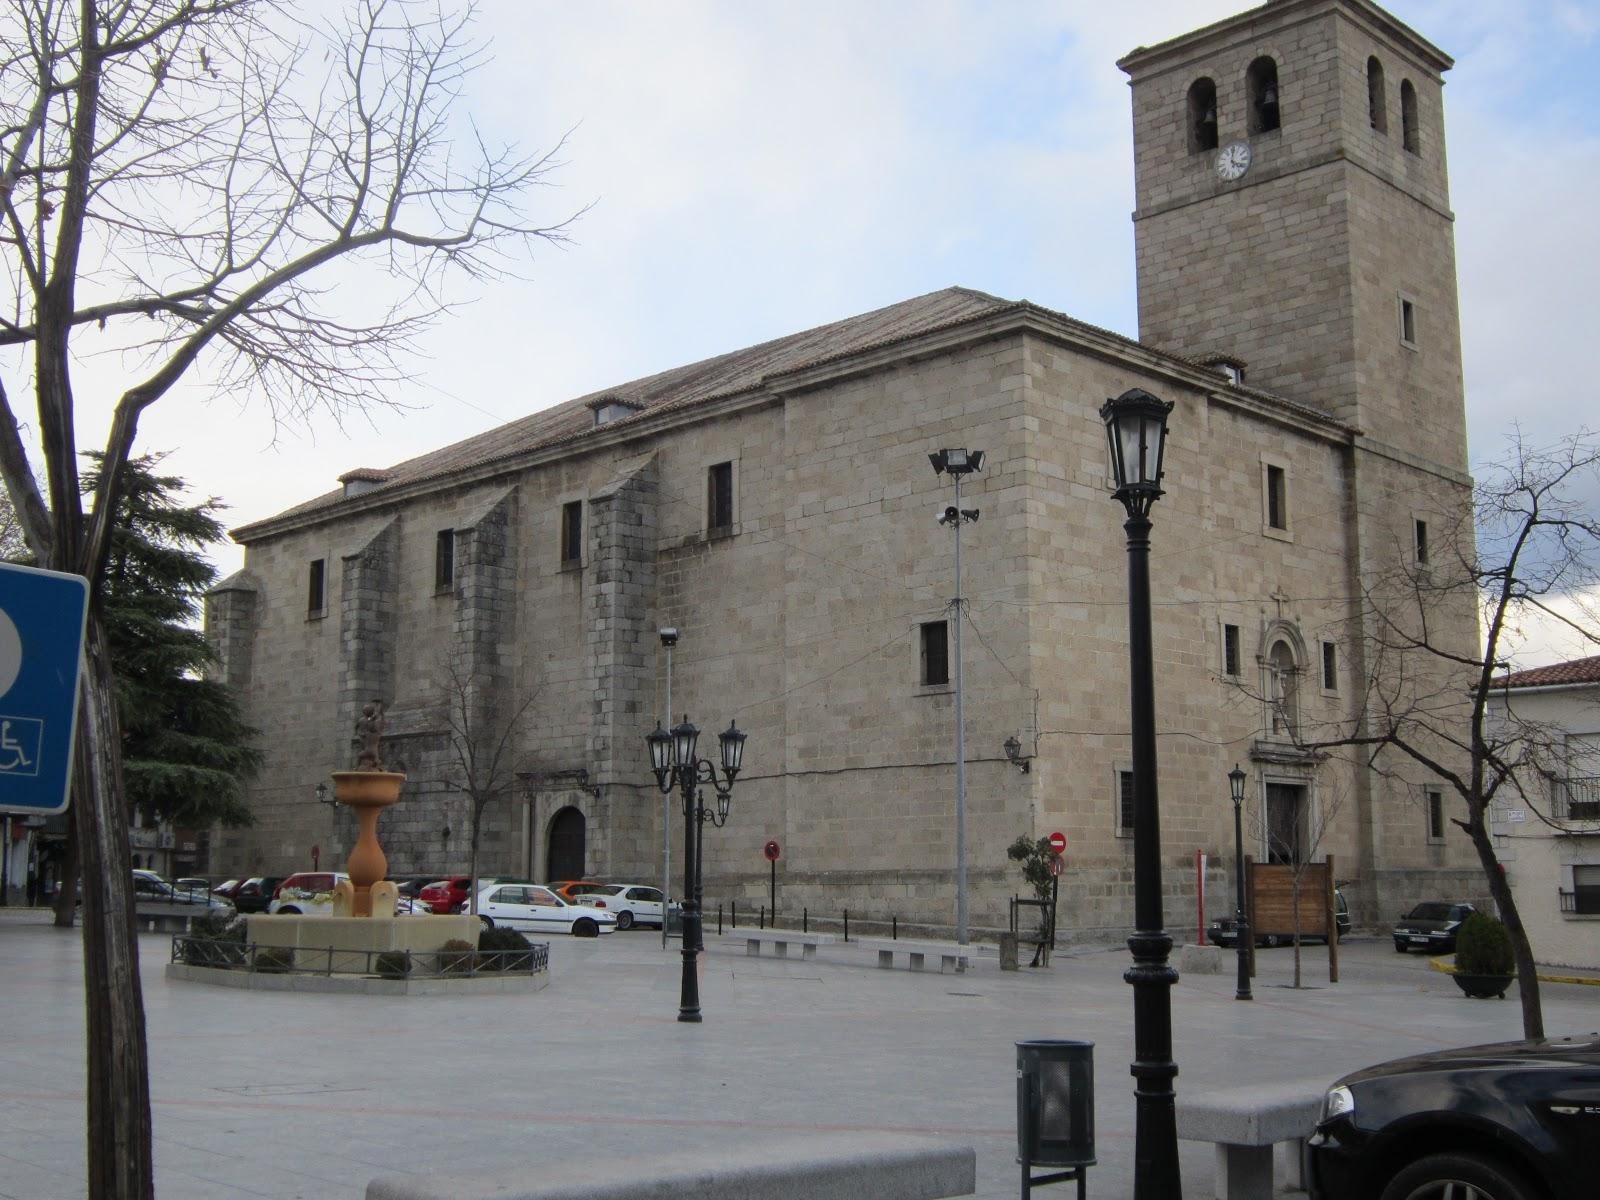 Blog de enrique iglesia santiago apostol for Fabrica de granito en santiago